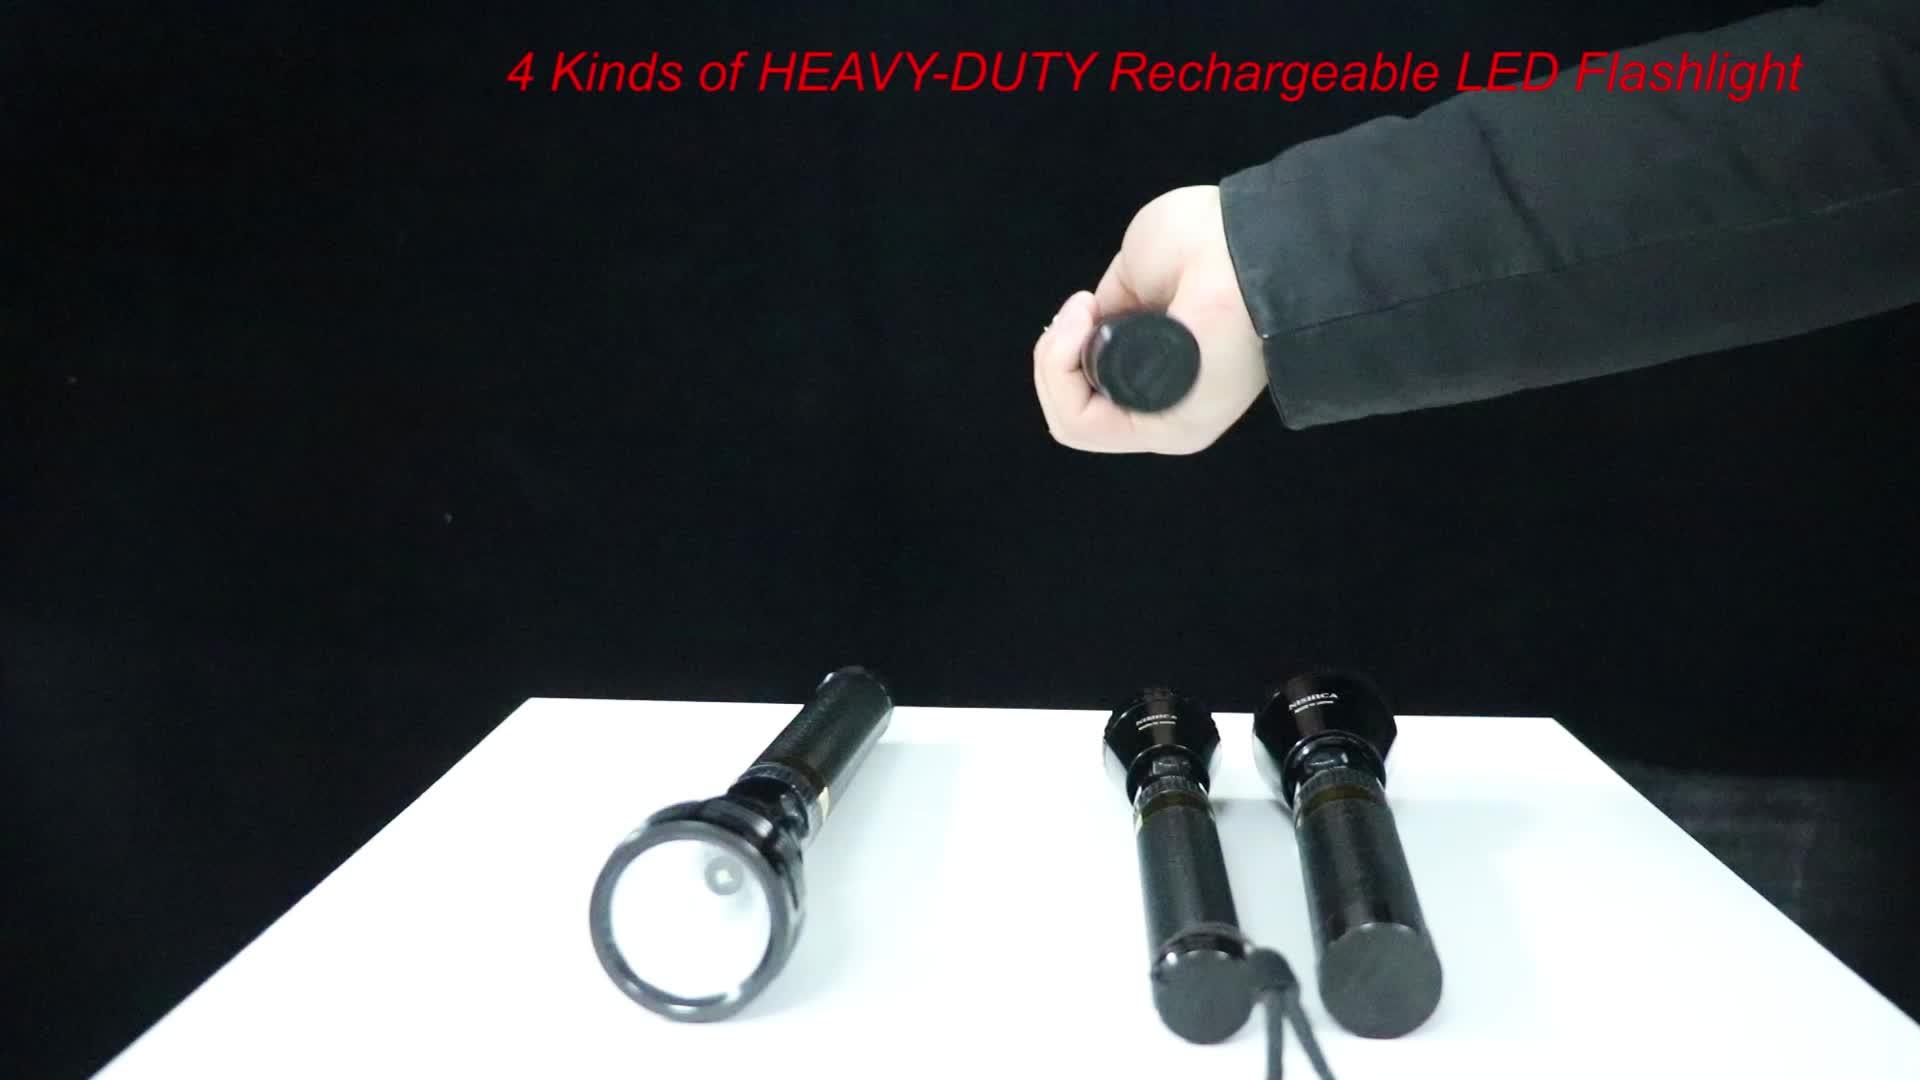 Aluminum Alloy Heavy-Duty Incandescent 2SC Battery Rechargeable Security Big 130 Lumens LED Flashlight